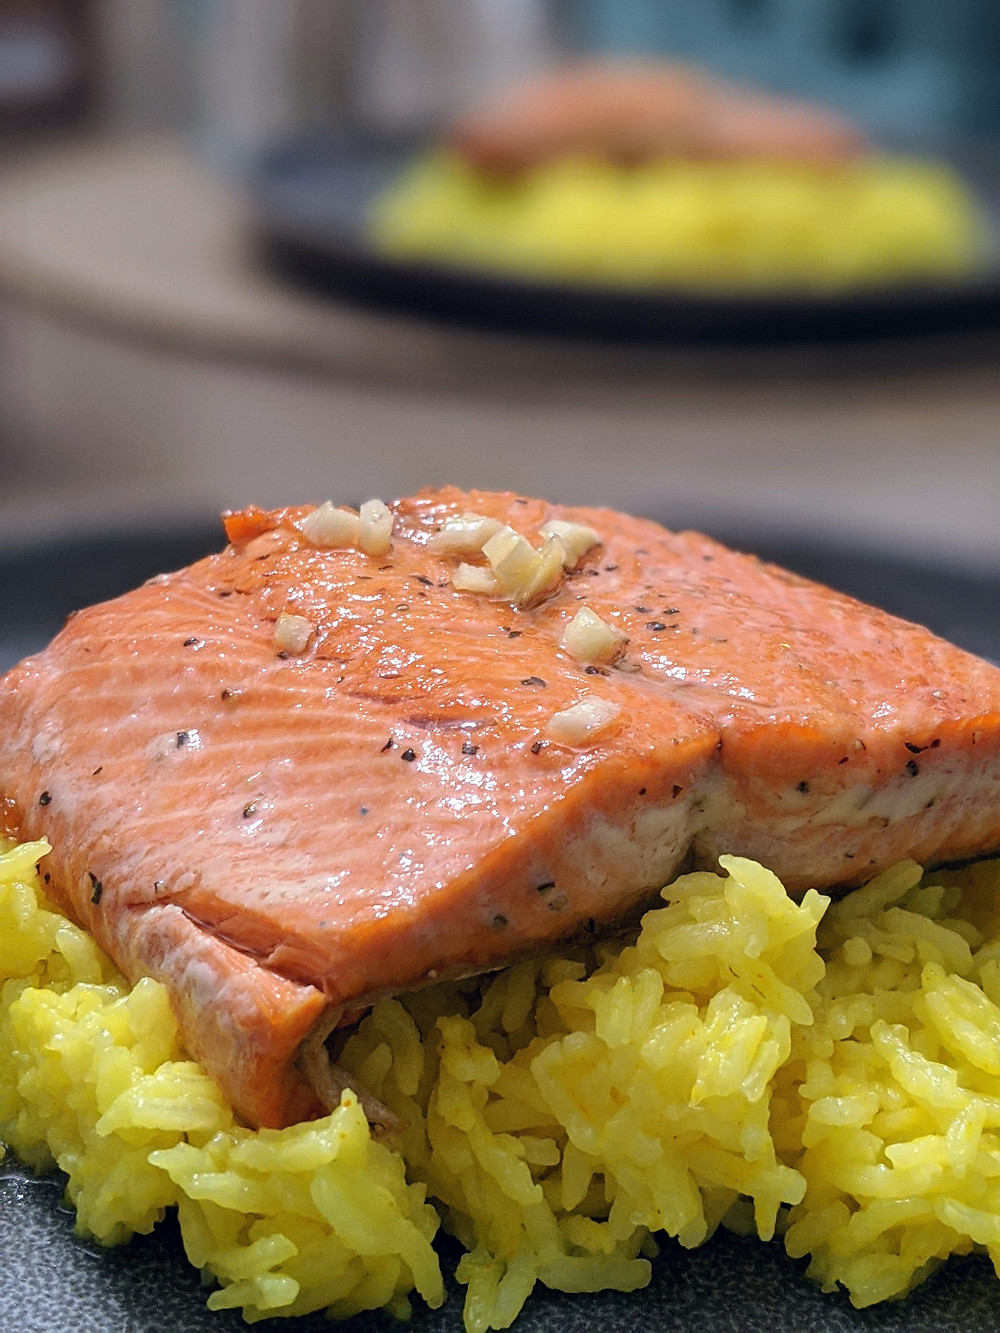 Honey Garlic Salmon - The Sunday Cookbook - Food Allergy Recipes